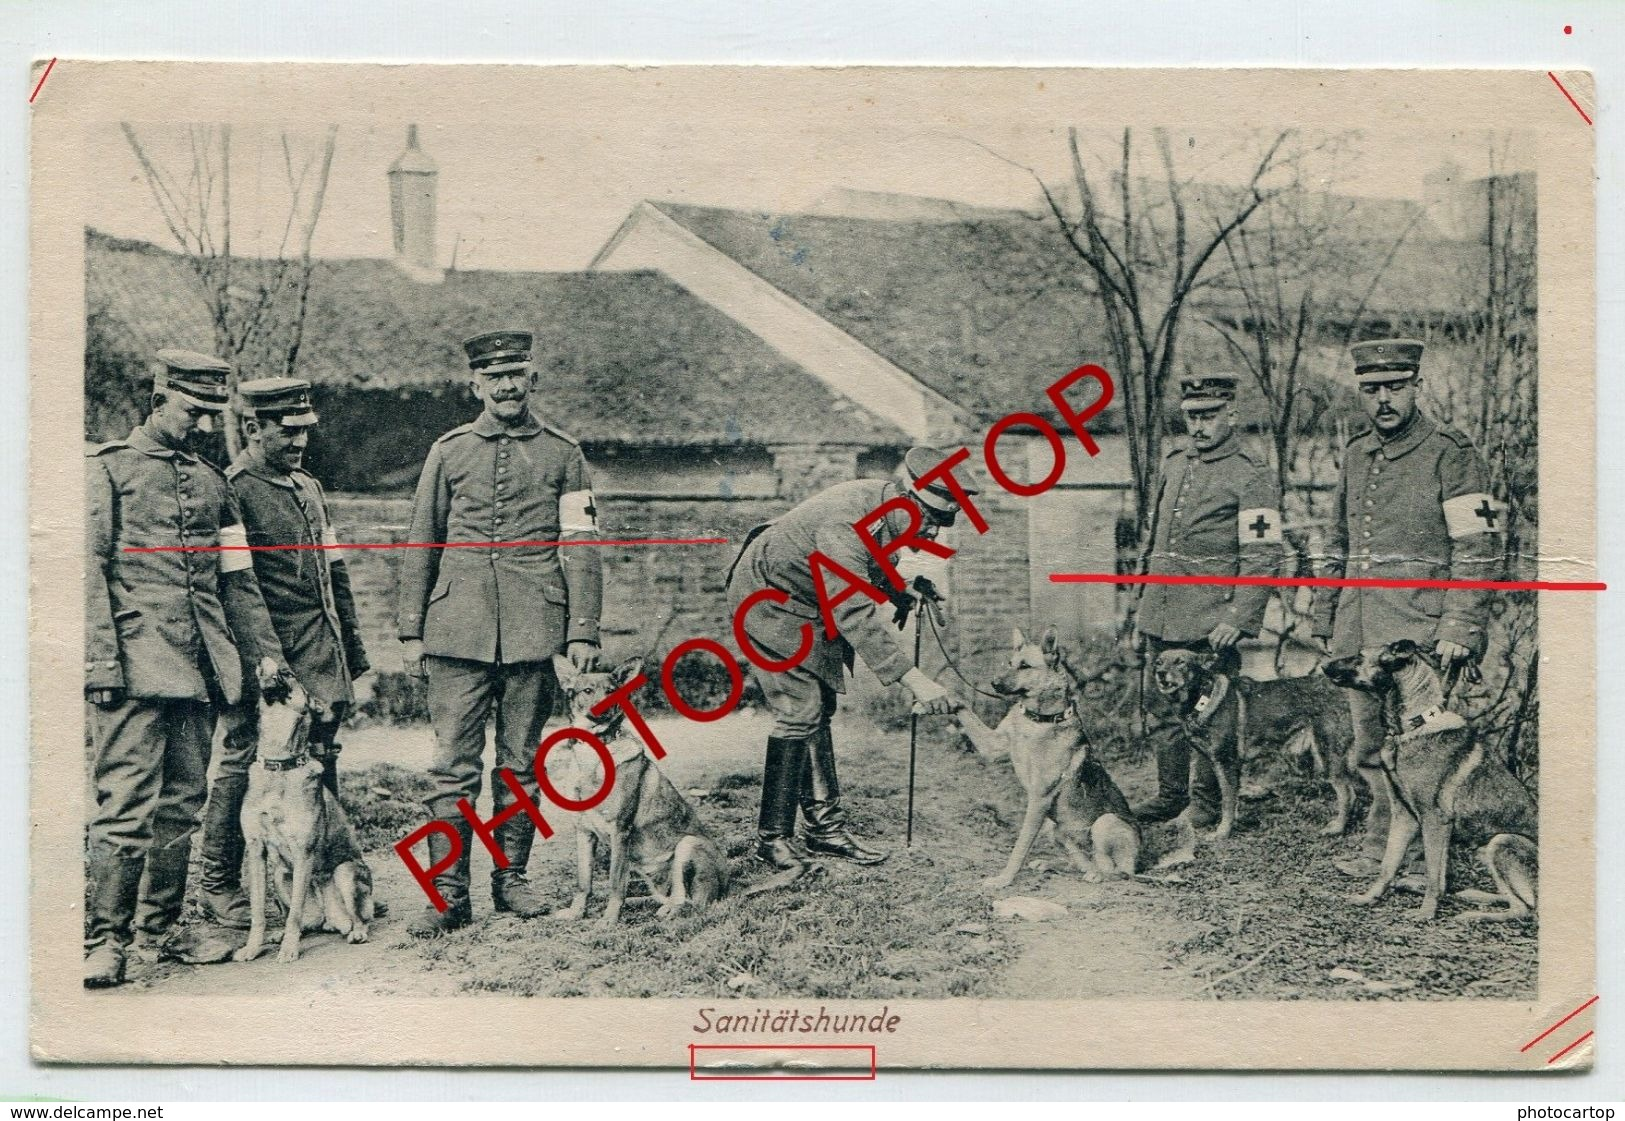 CHIENS Secouristes-Croix Rouge-NON SITUEE-CARTE Imprimee Allemande-Guerre 14-18-1 WK-Militaria-Feldpost - Oorlog 1914-18